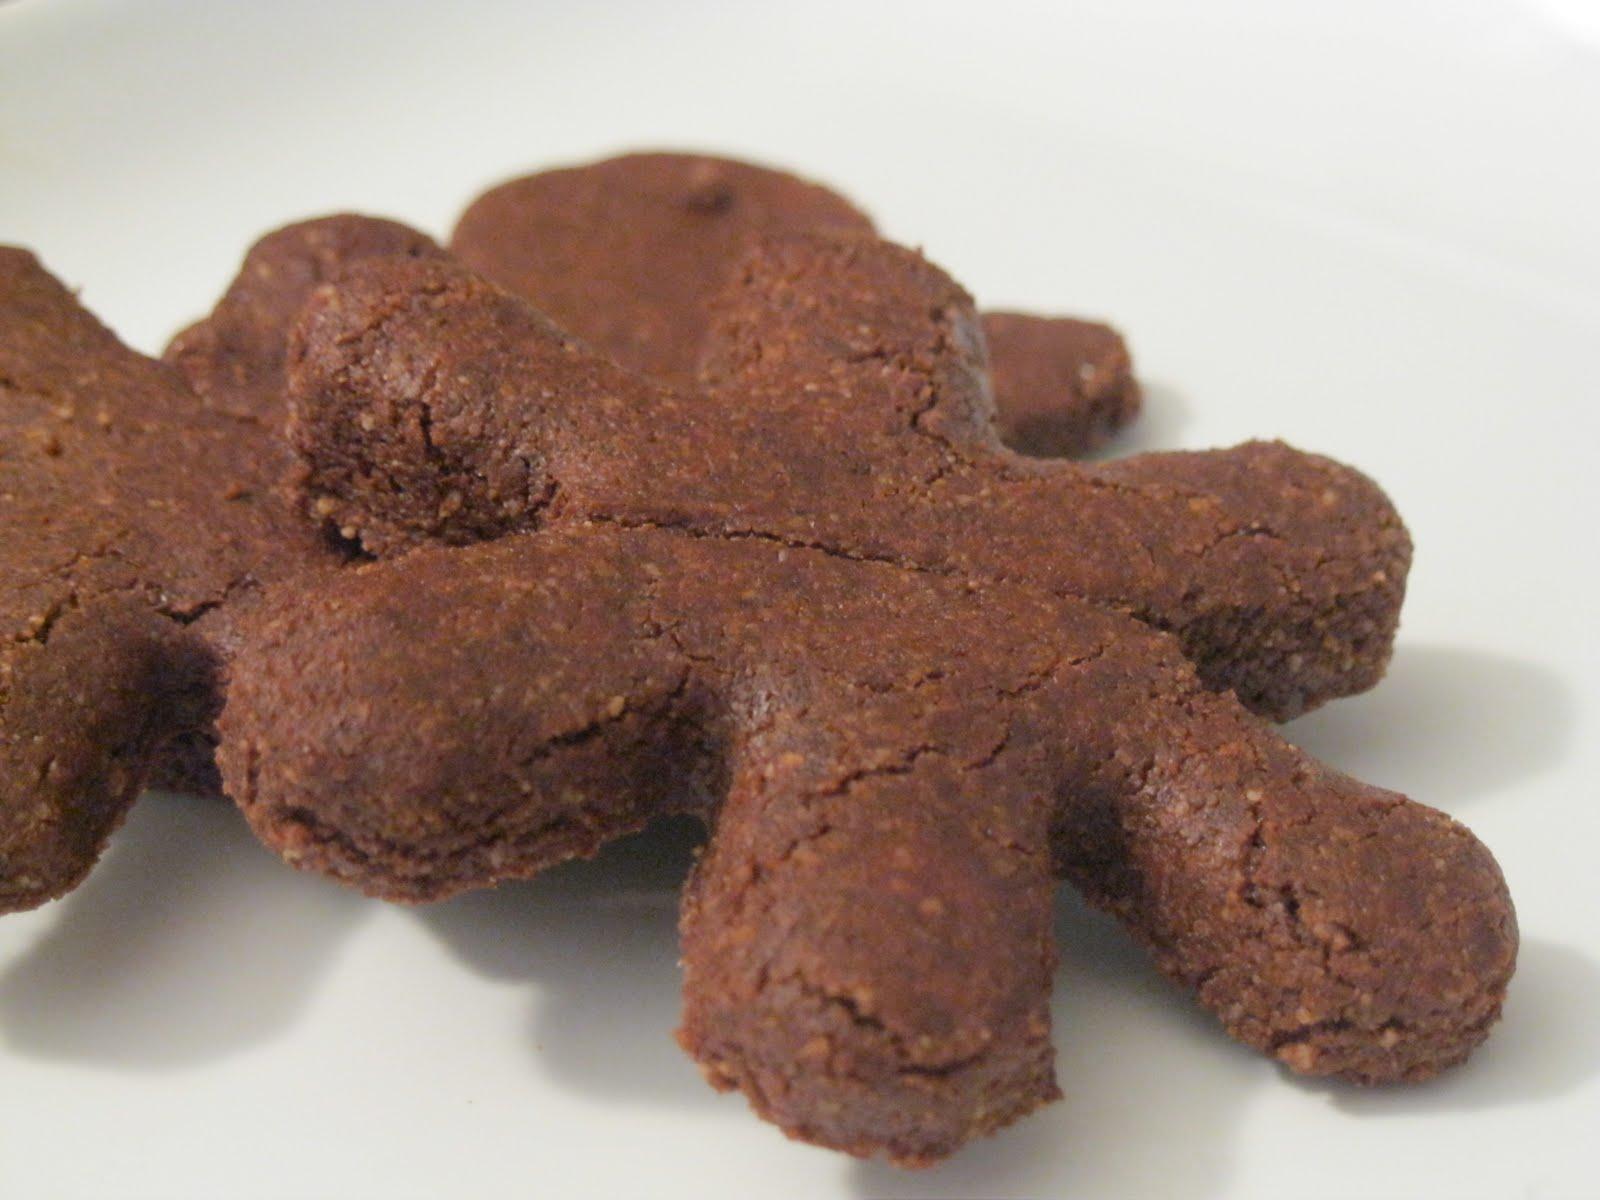 The District Chocoholic Basler Brusnli Chocolate Almond Cookies